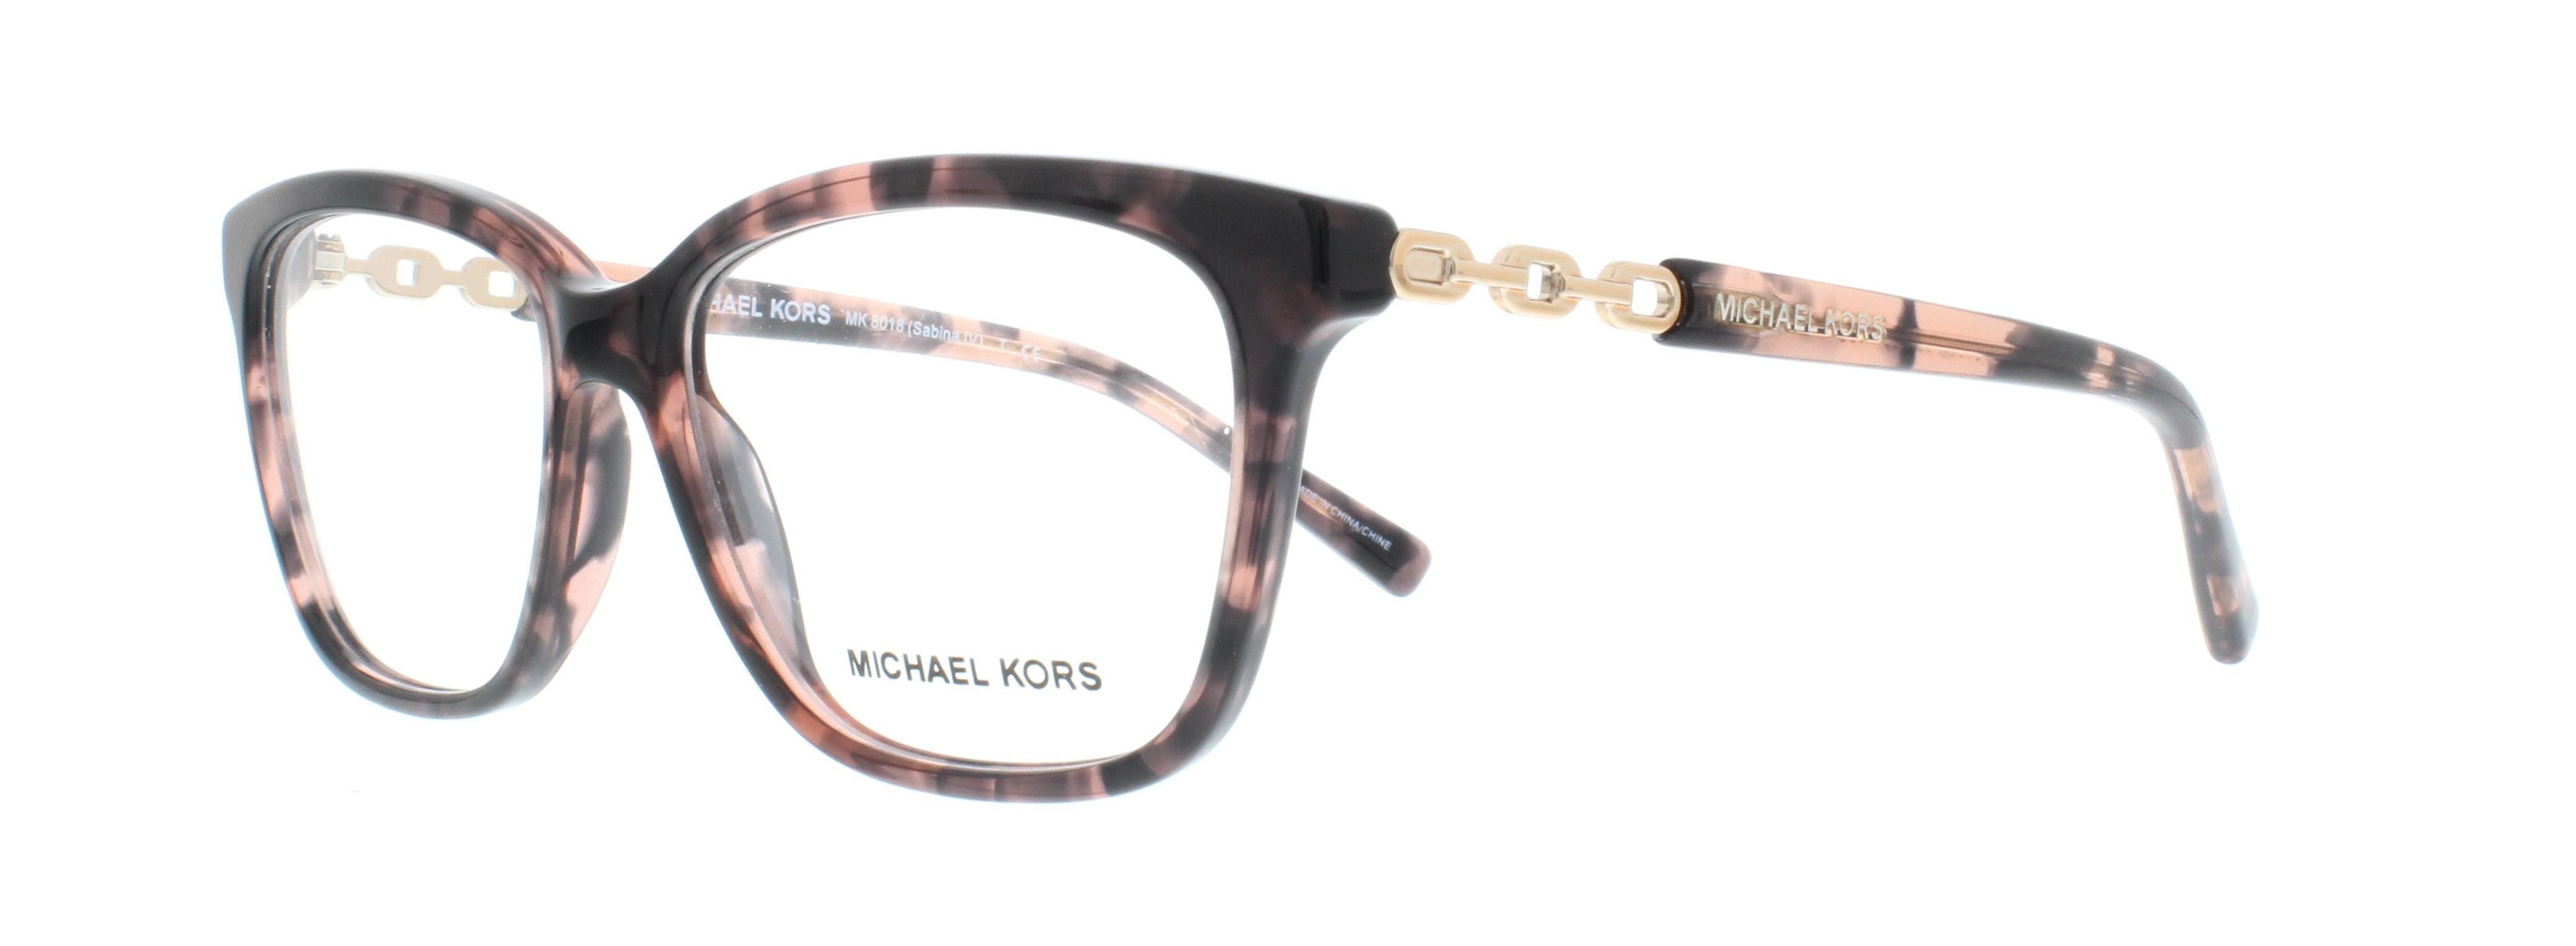 1892de1c0c MICHAEL KORS Eyeglasses MK8018 SABINA IV 3108 Pink Tortoise Rose Gold 52MM